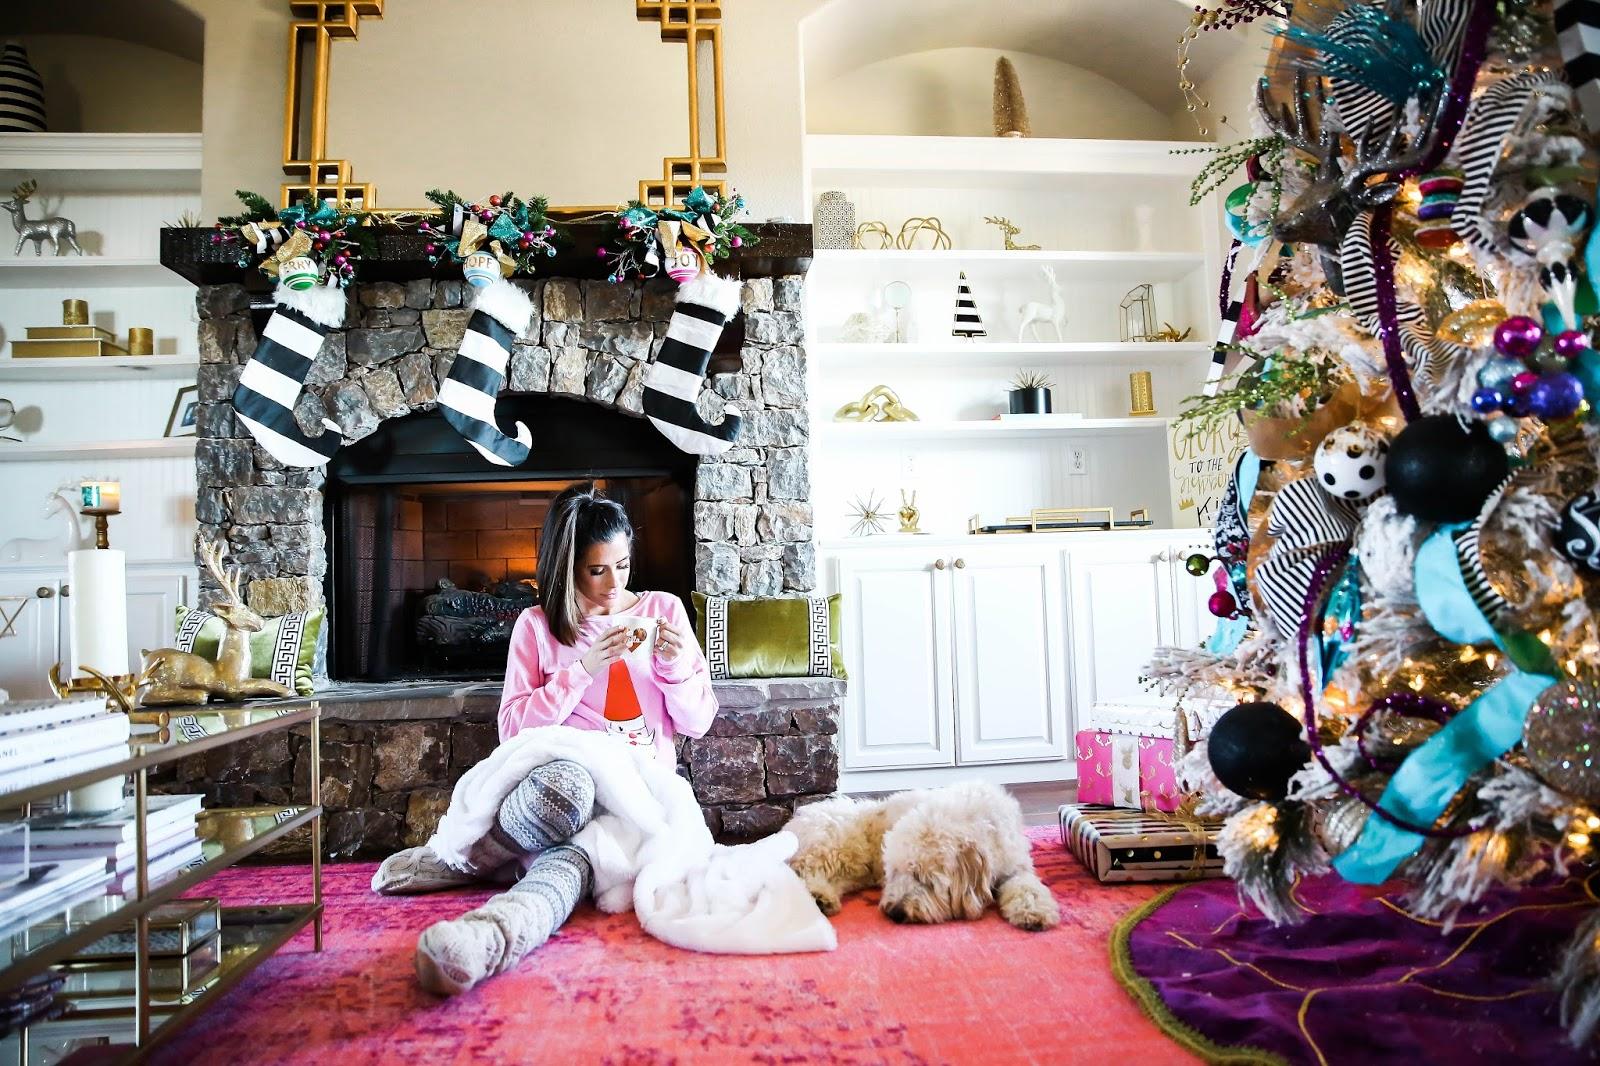 Our Whimsical Christmas Formal Living Area